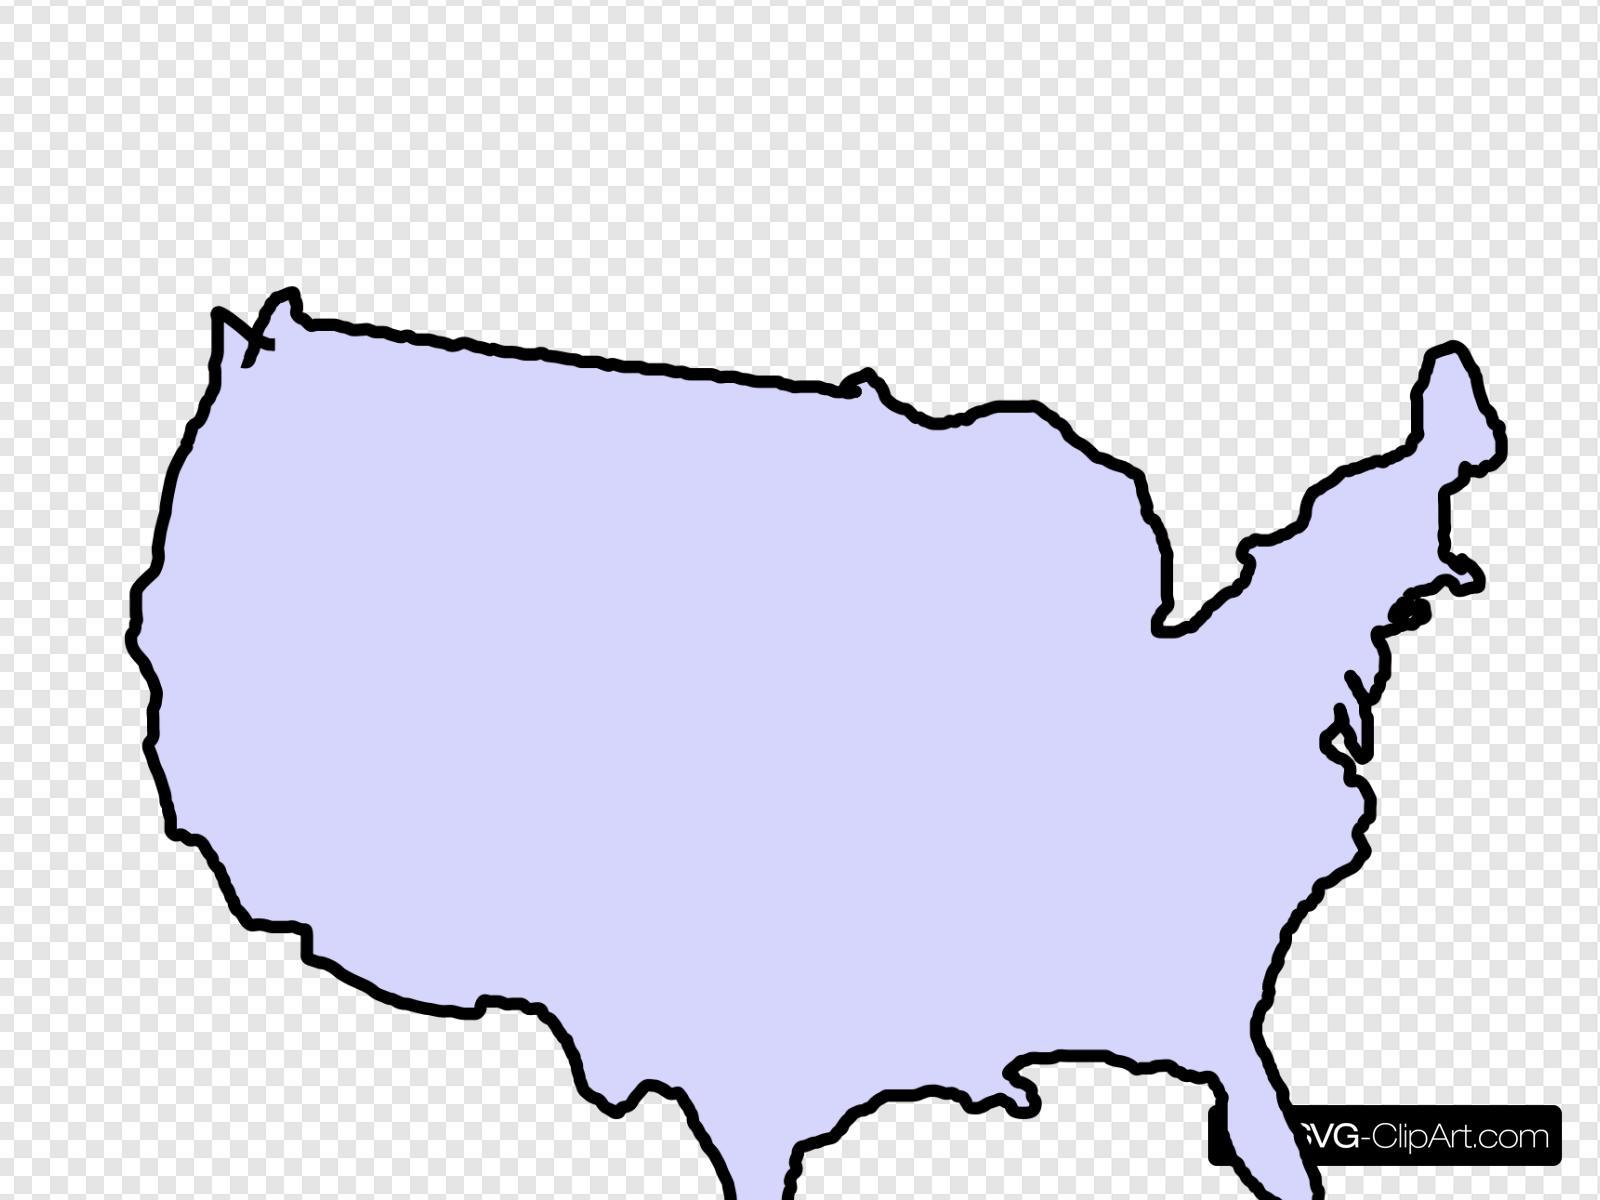 Usa clipart grey. Map clip art icon